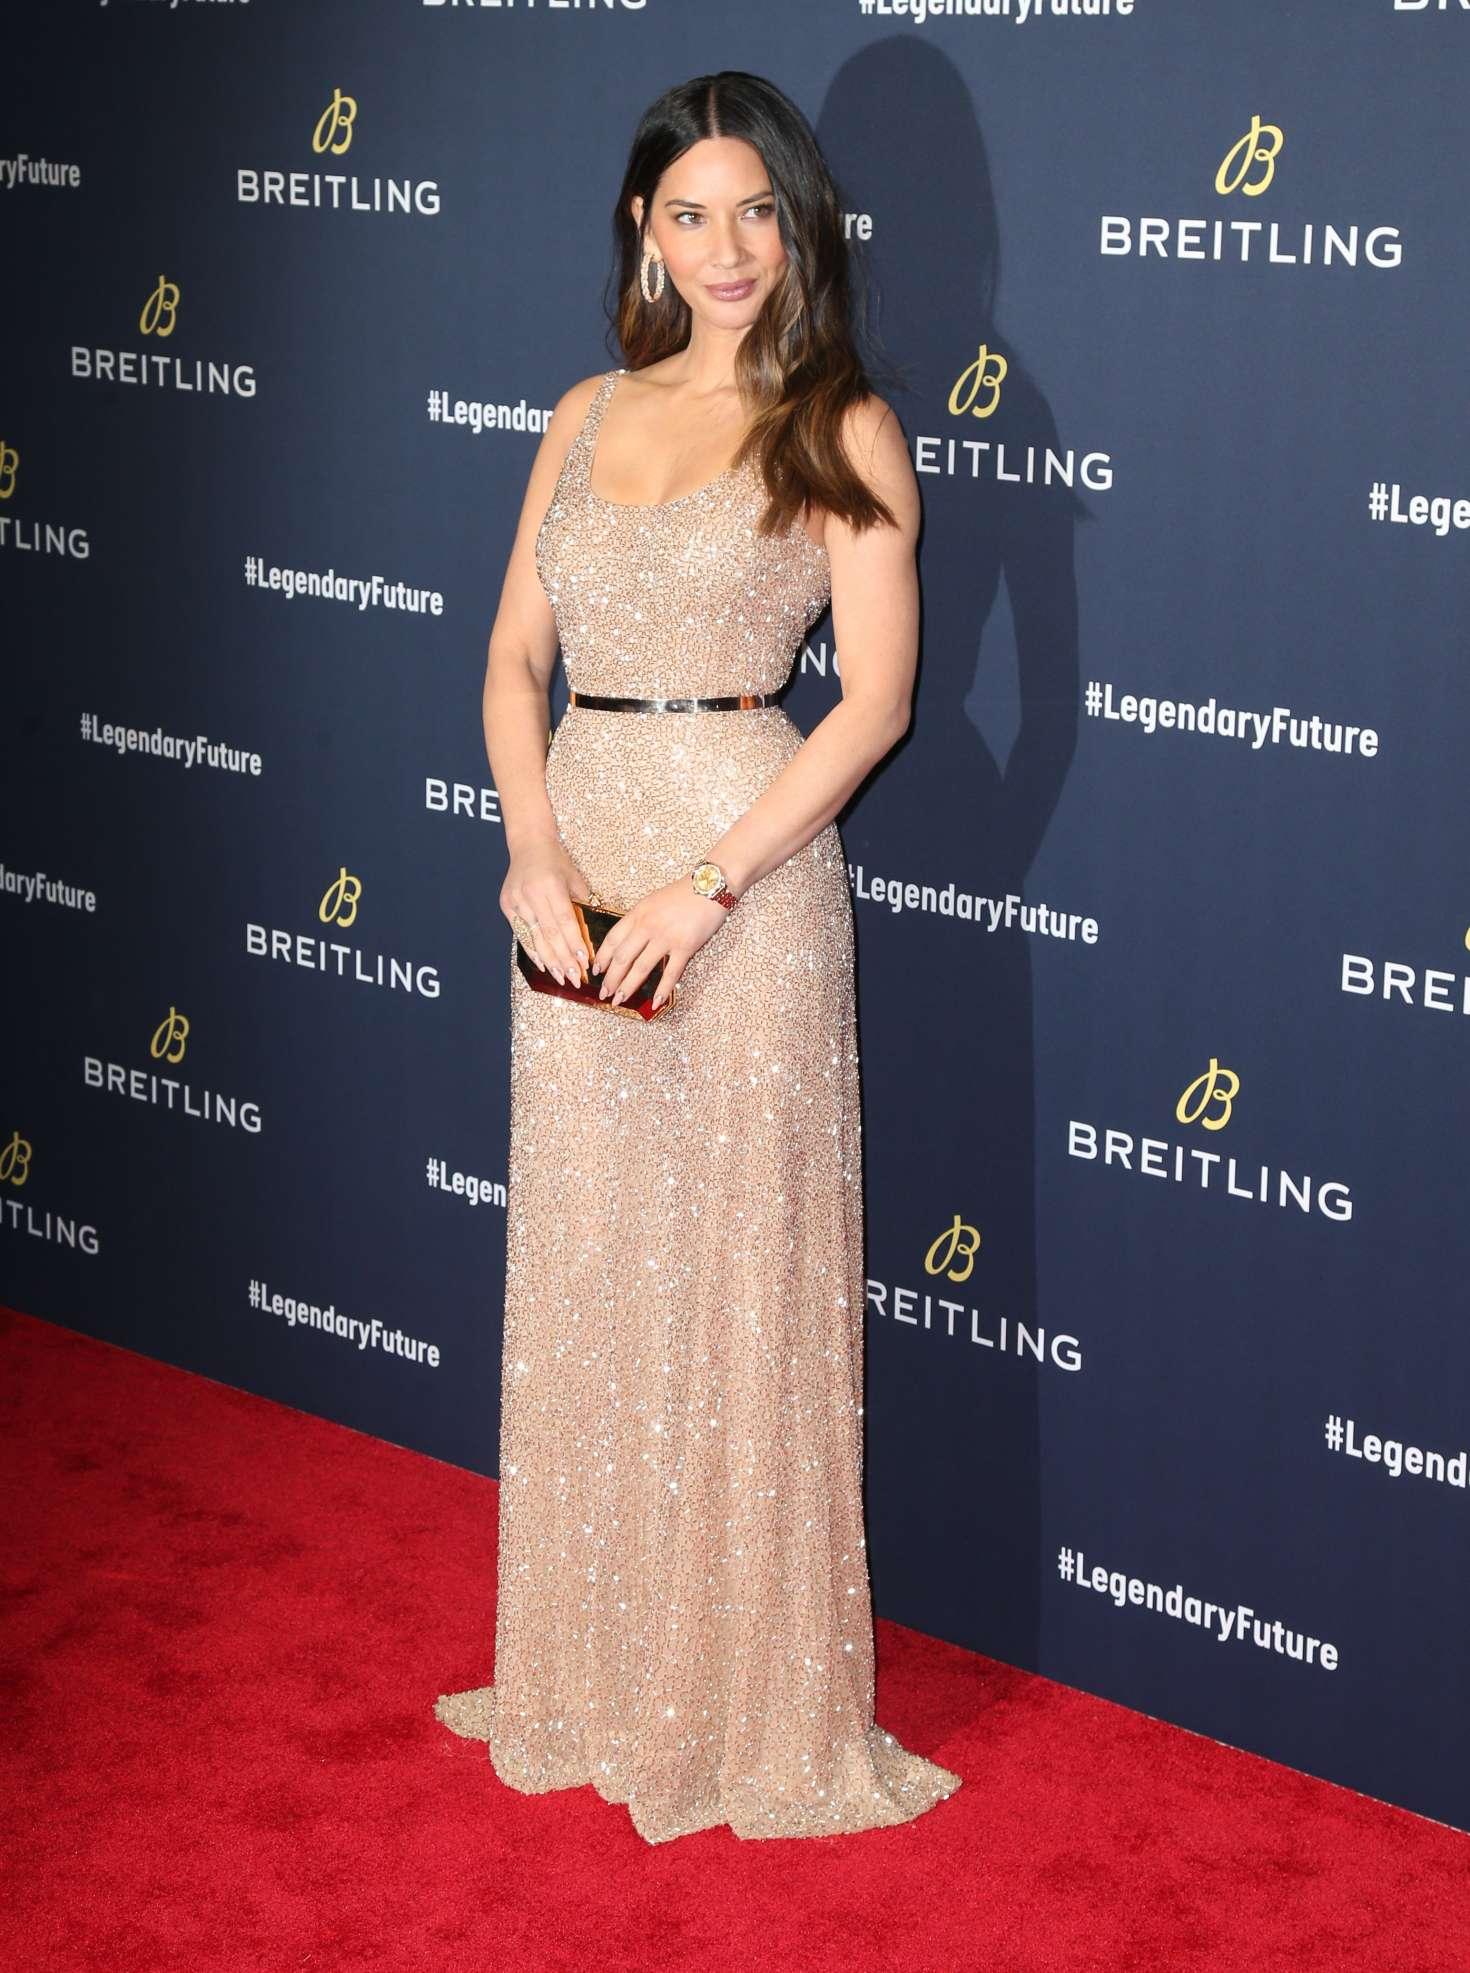 Olivia Munn 2018 : Olivia Munn: Breitling Global Roadshow Event -23